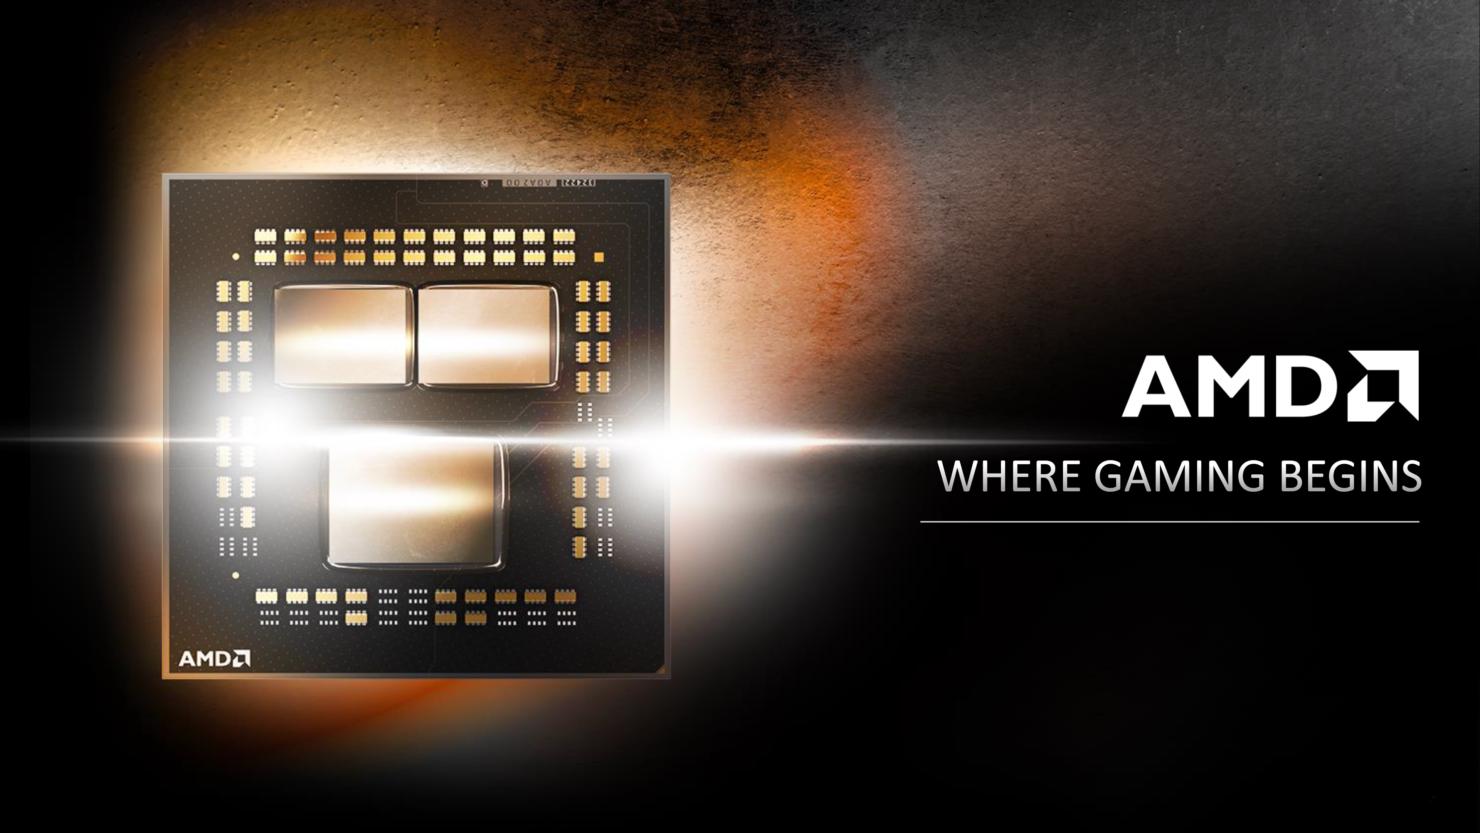 amd-ryzen-desktop-cpus-hit-30%-share-on-steam-versus-intel,-8-core-&-6-core-chips-gaining-popularity